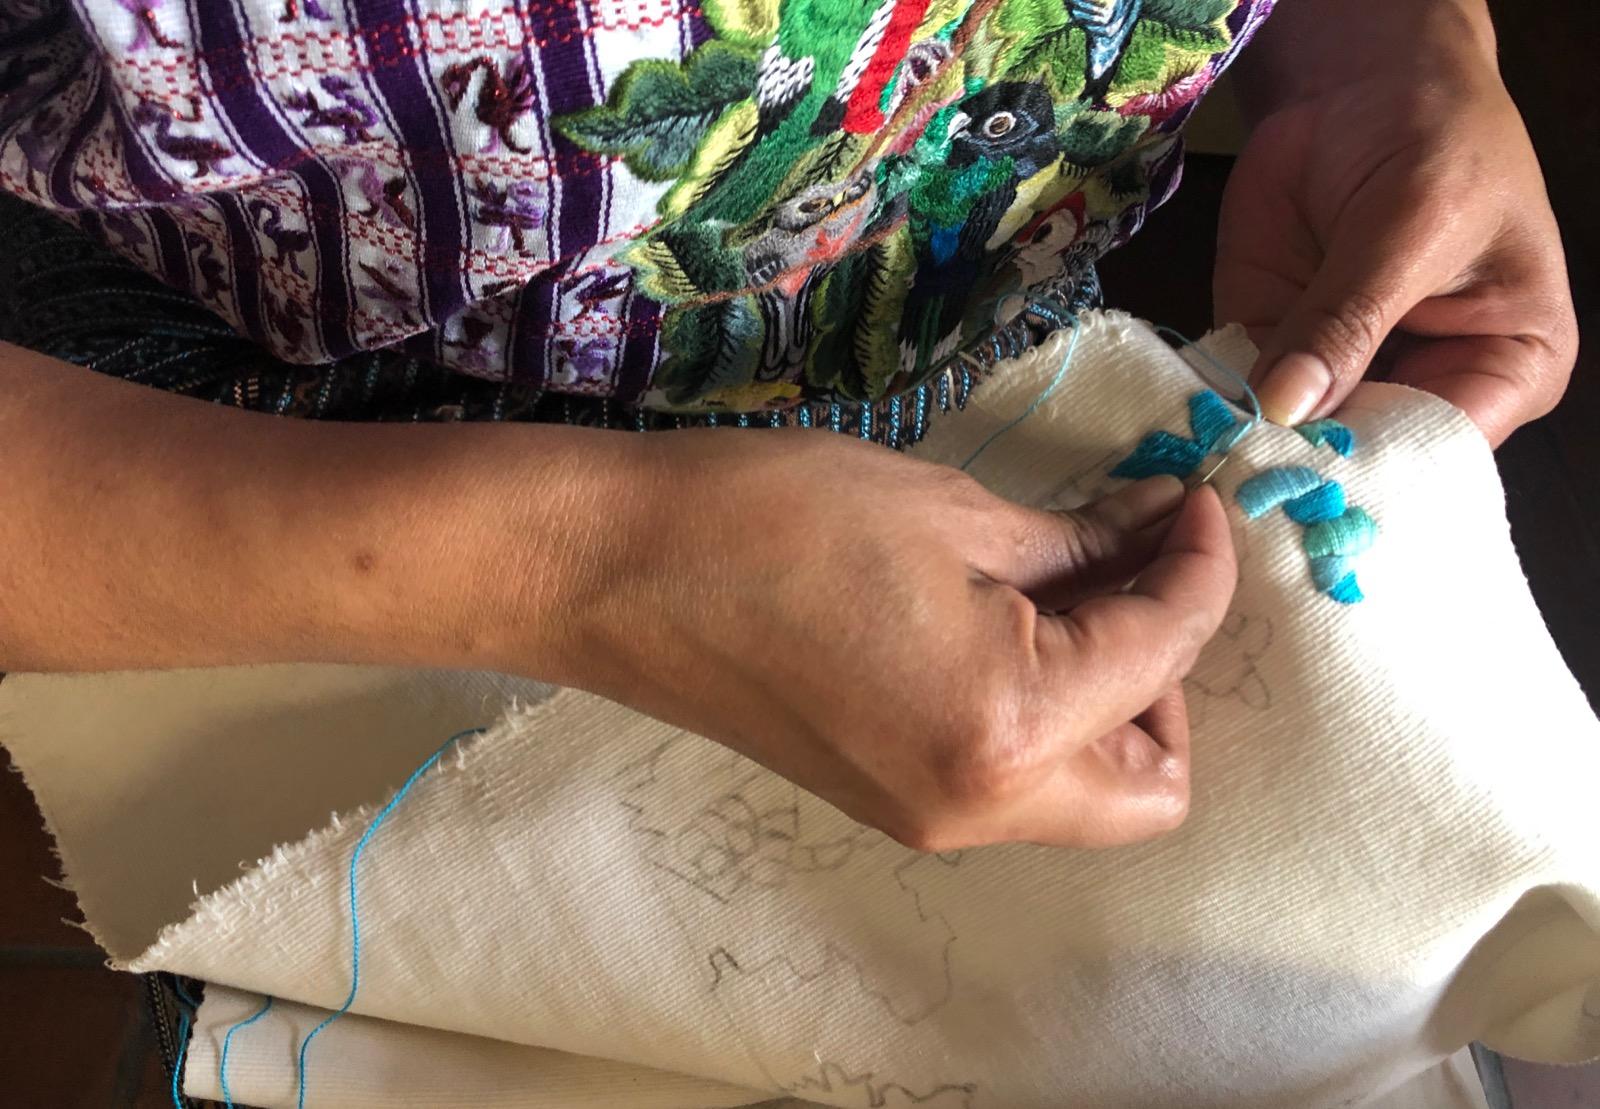 """Manos de oro"" or hands of gold - Tz'utujil weaving cooperative in Santiago Atitlán"